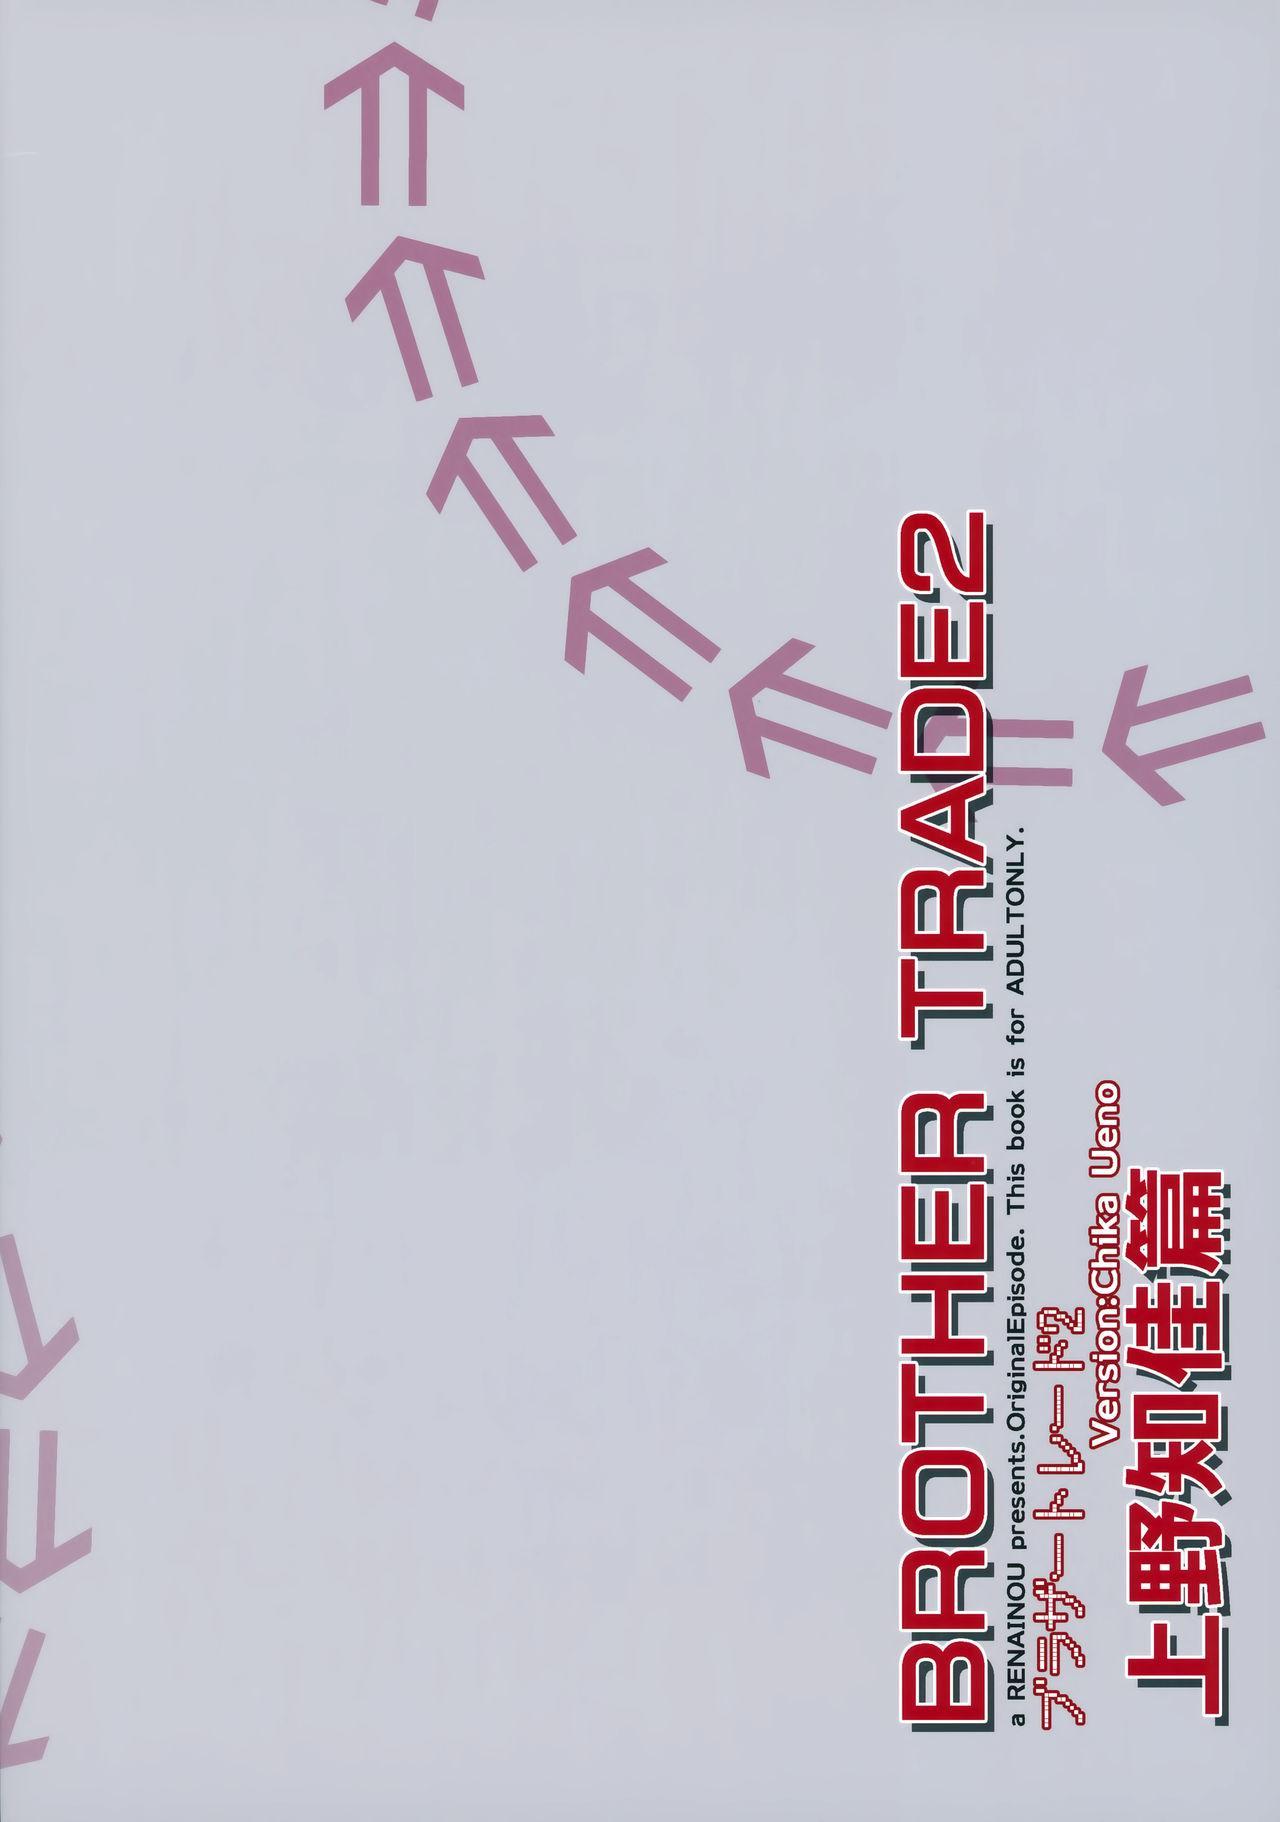 Brother Trade 2 Ueno Chika Hen 1